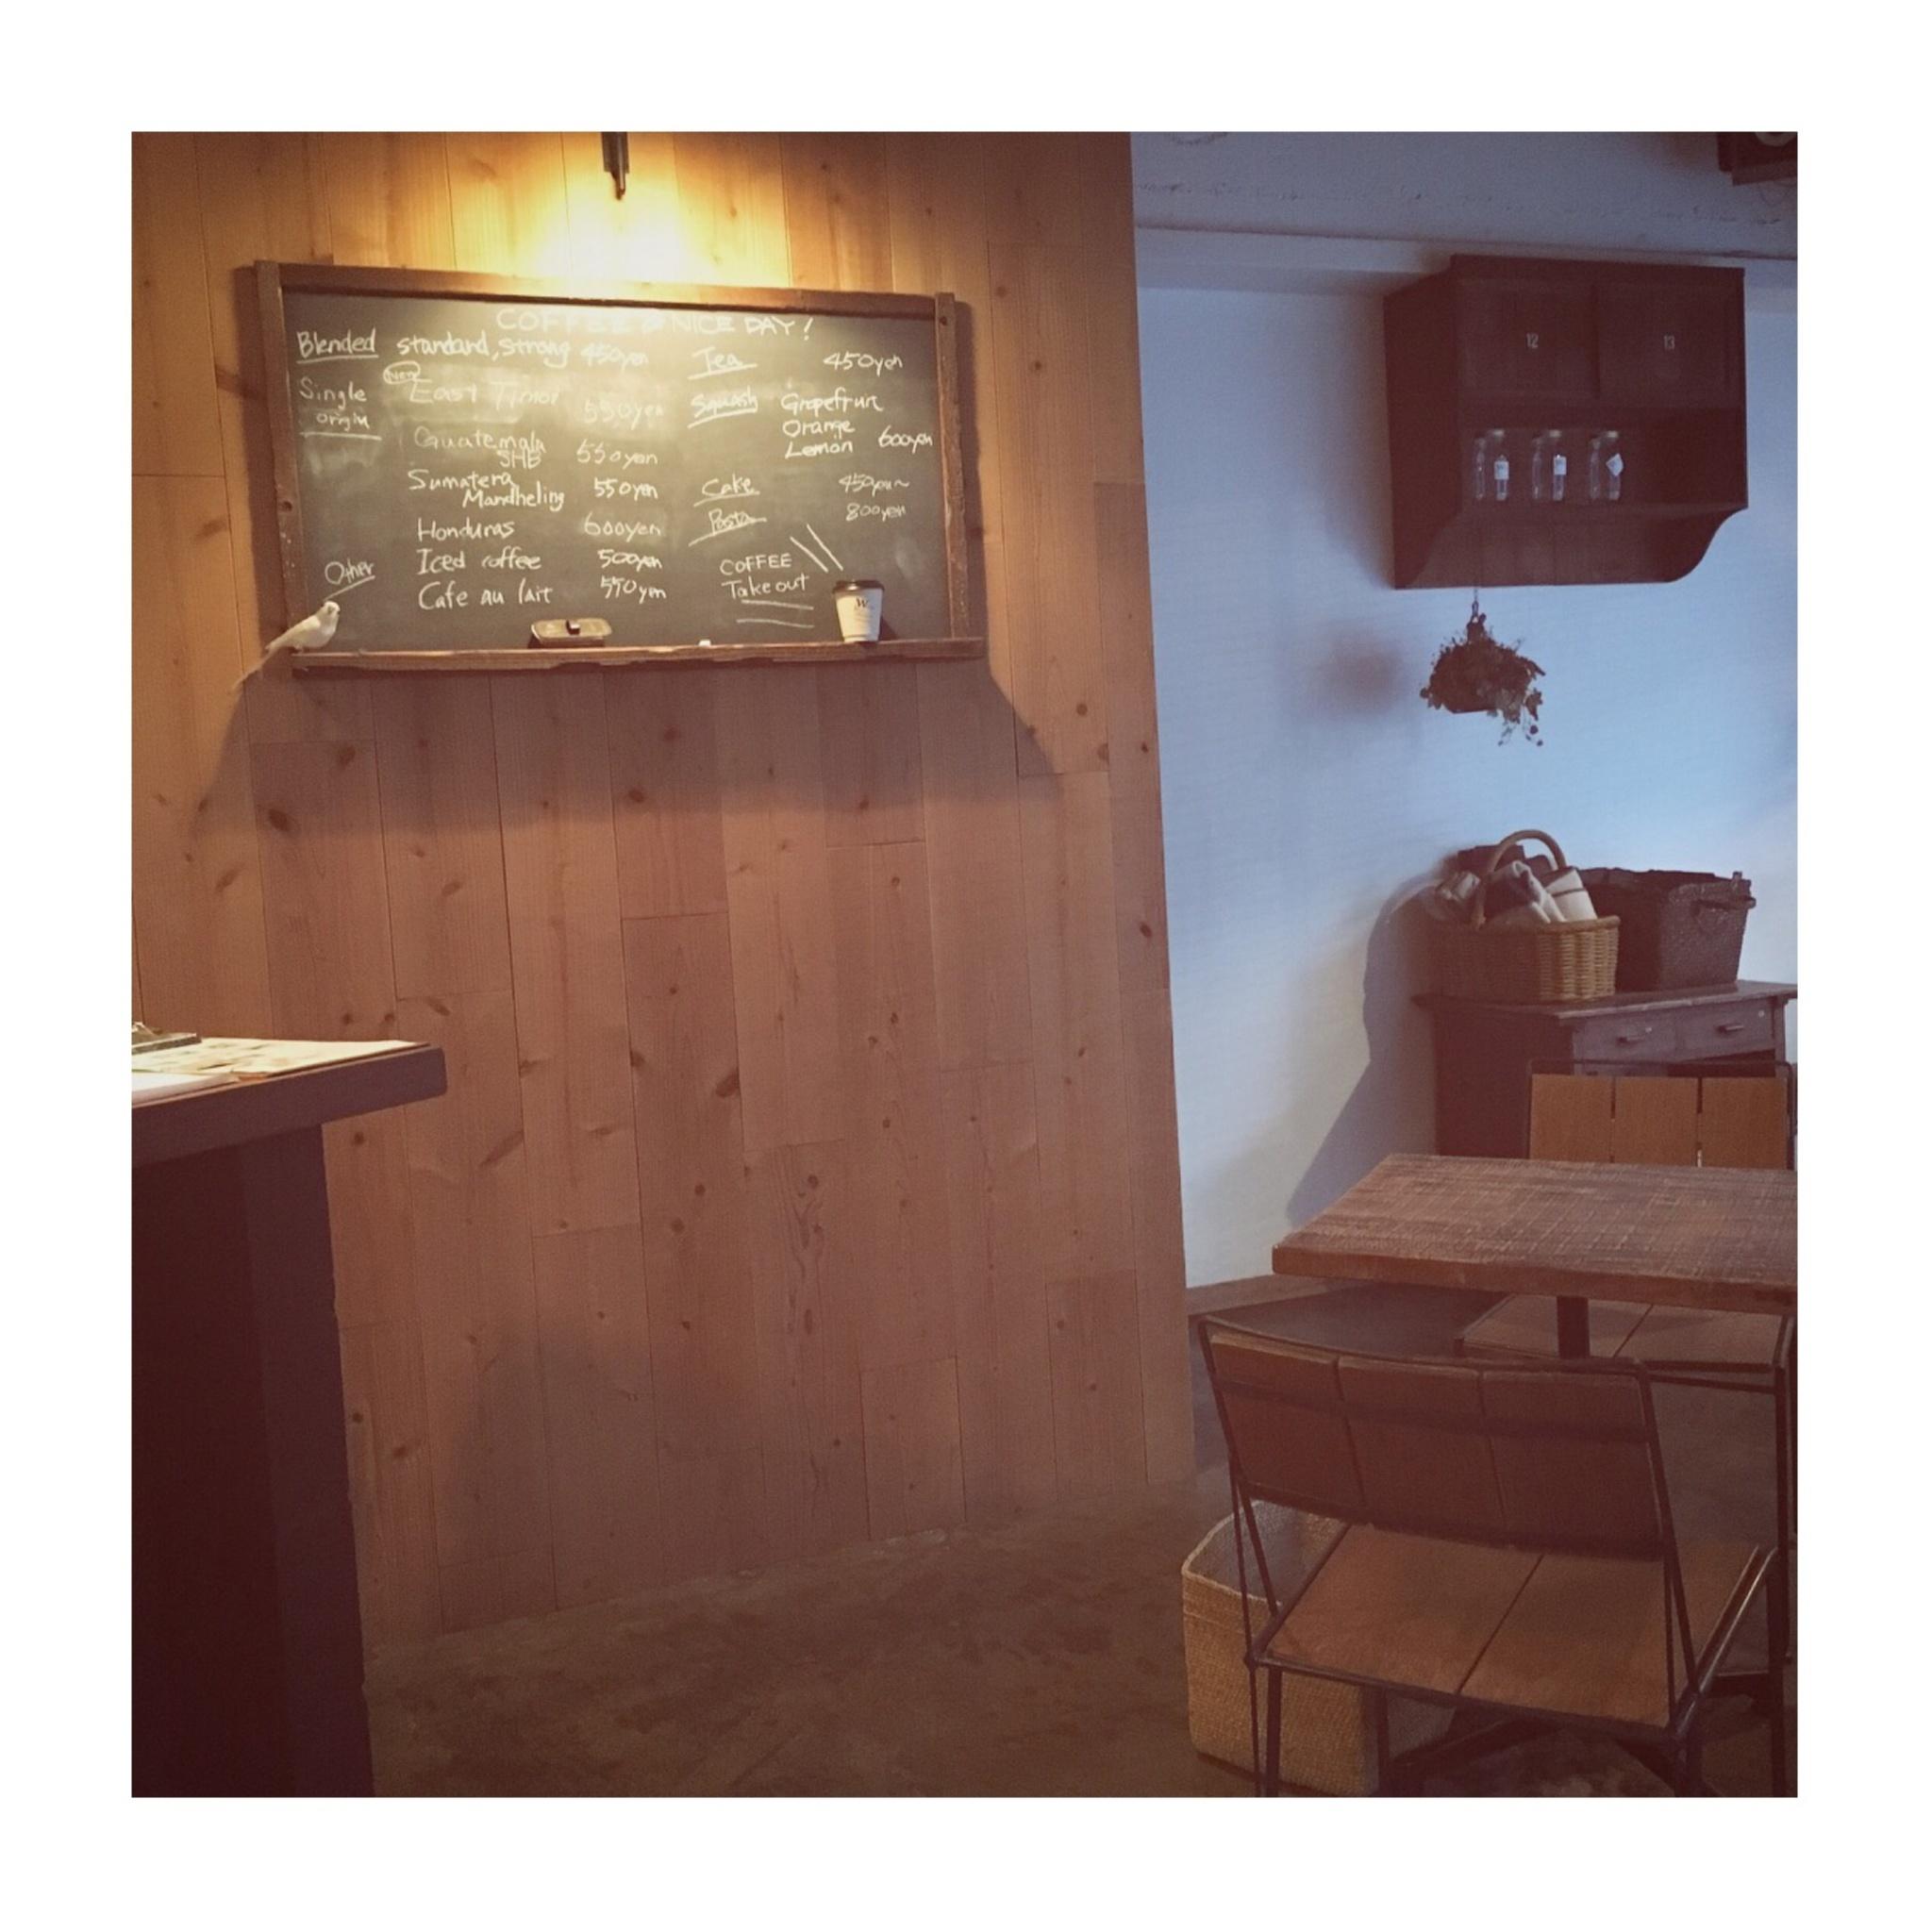 #7【#cafestagram】❤️:《大阪•梅田》バーのようなシックな空間で落ち着くカフェタイムを*「whitebird coffee stand」☻_3